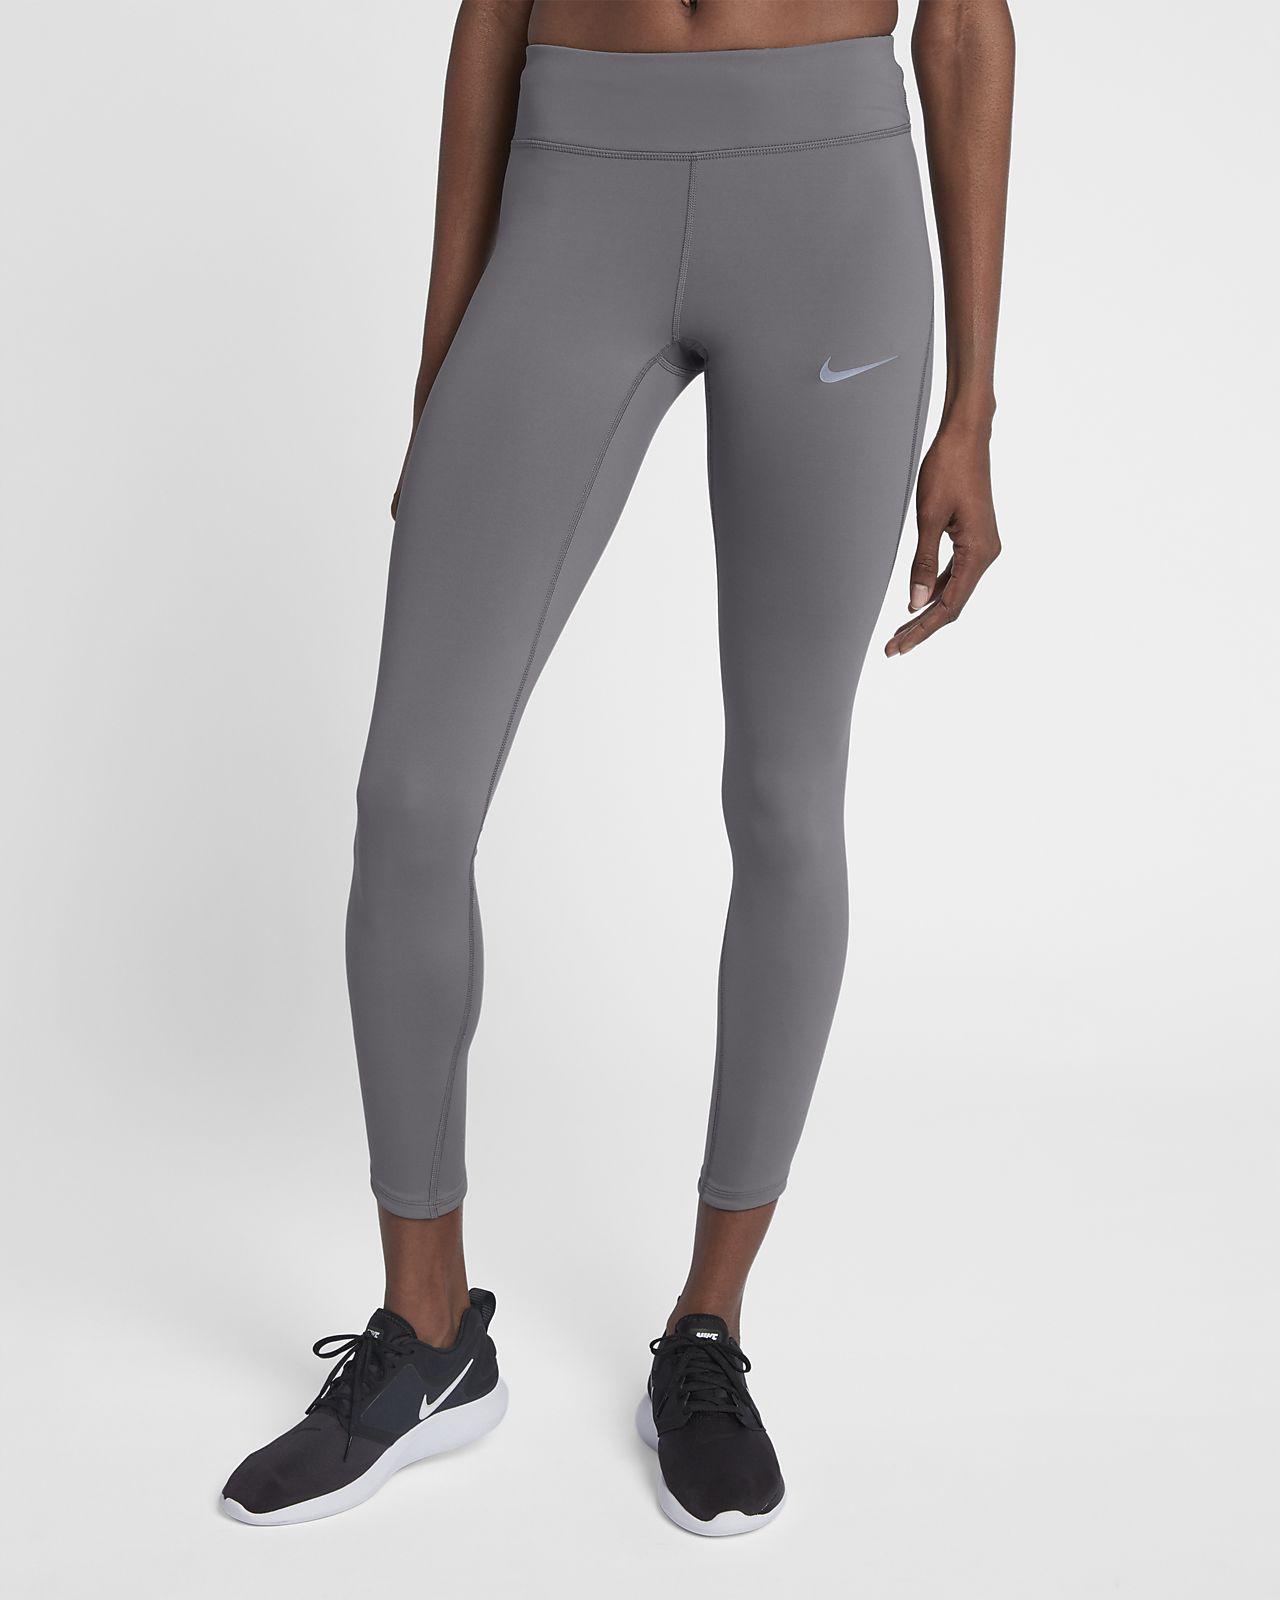 8a0283bb7 Nike Epic Lux løpetights med mellomhøyt liv til dame